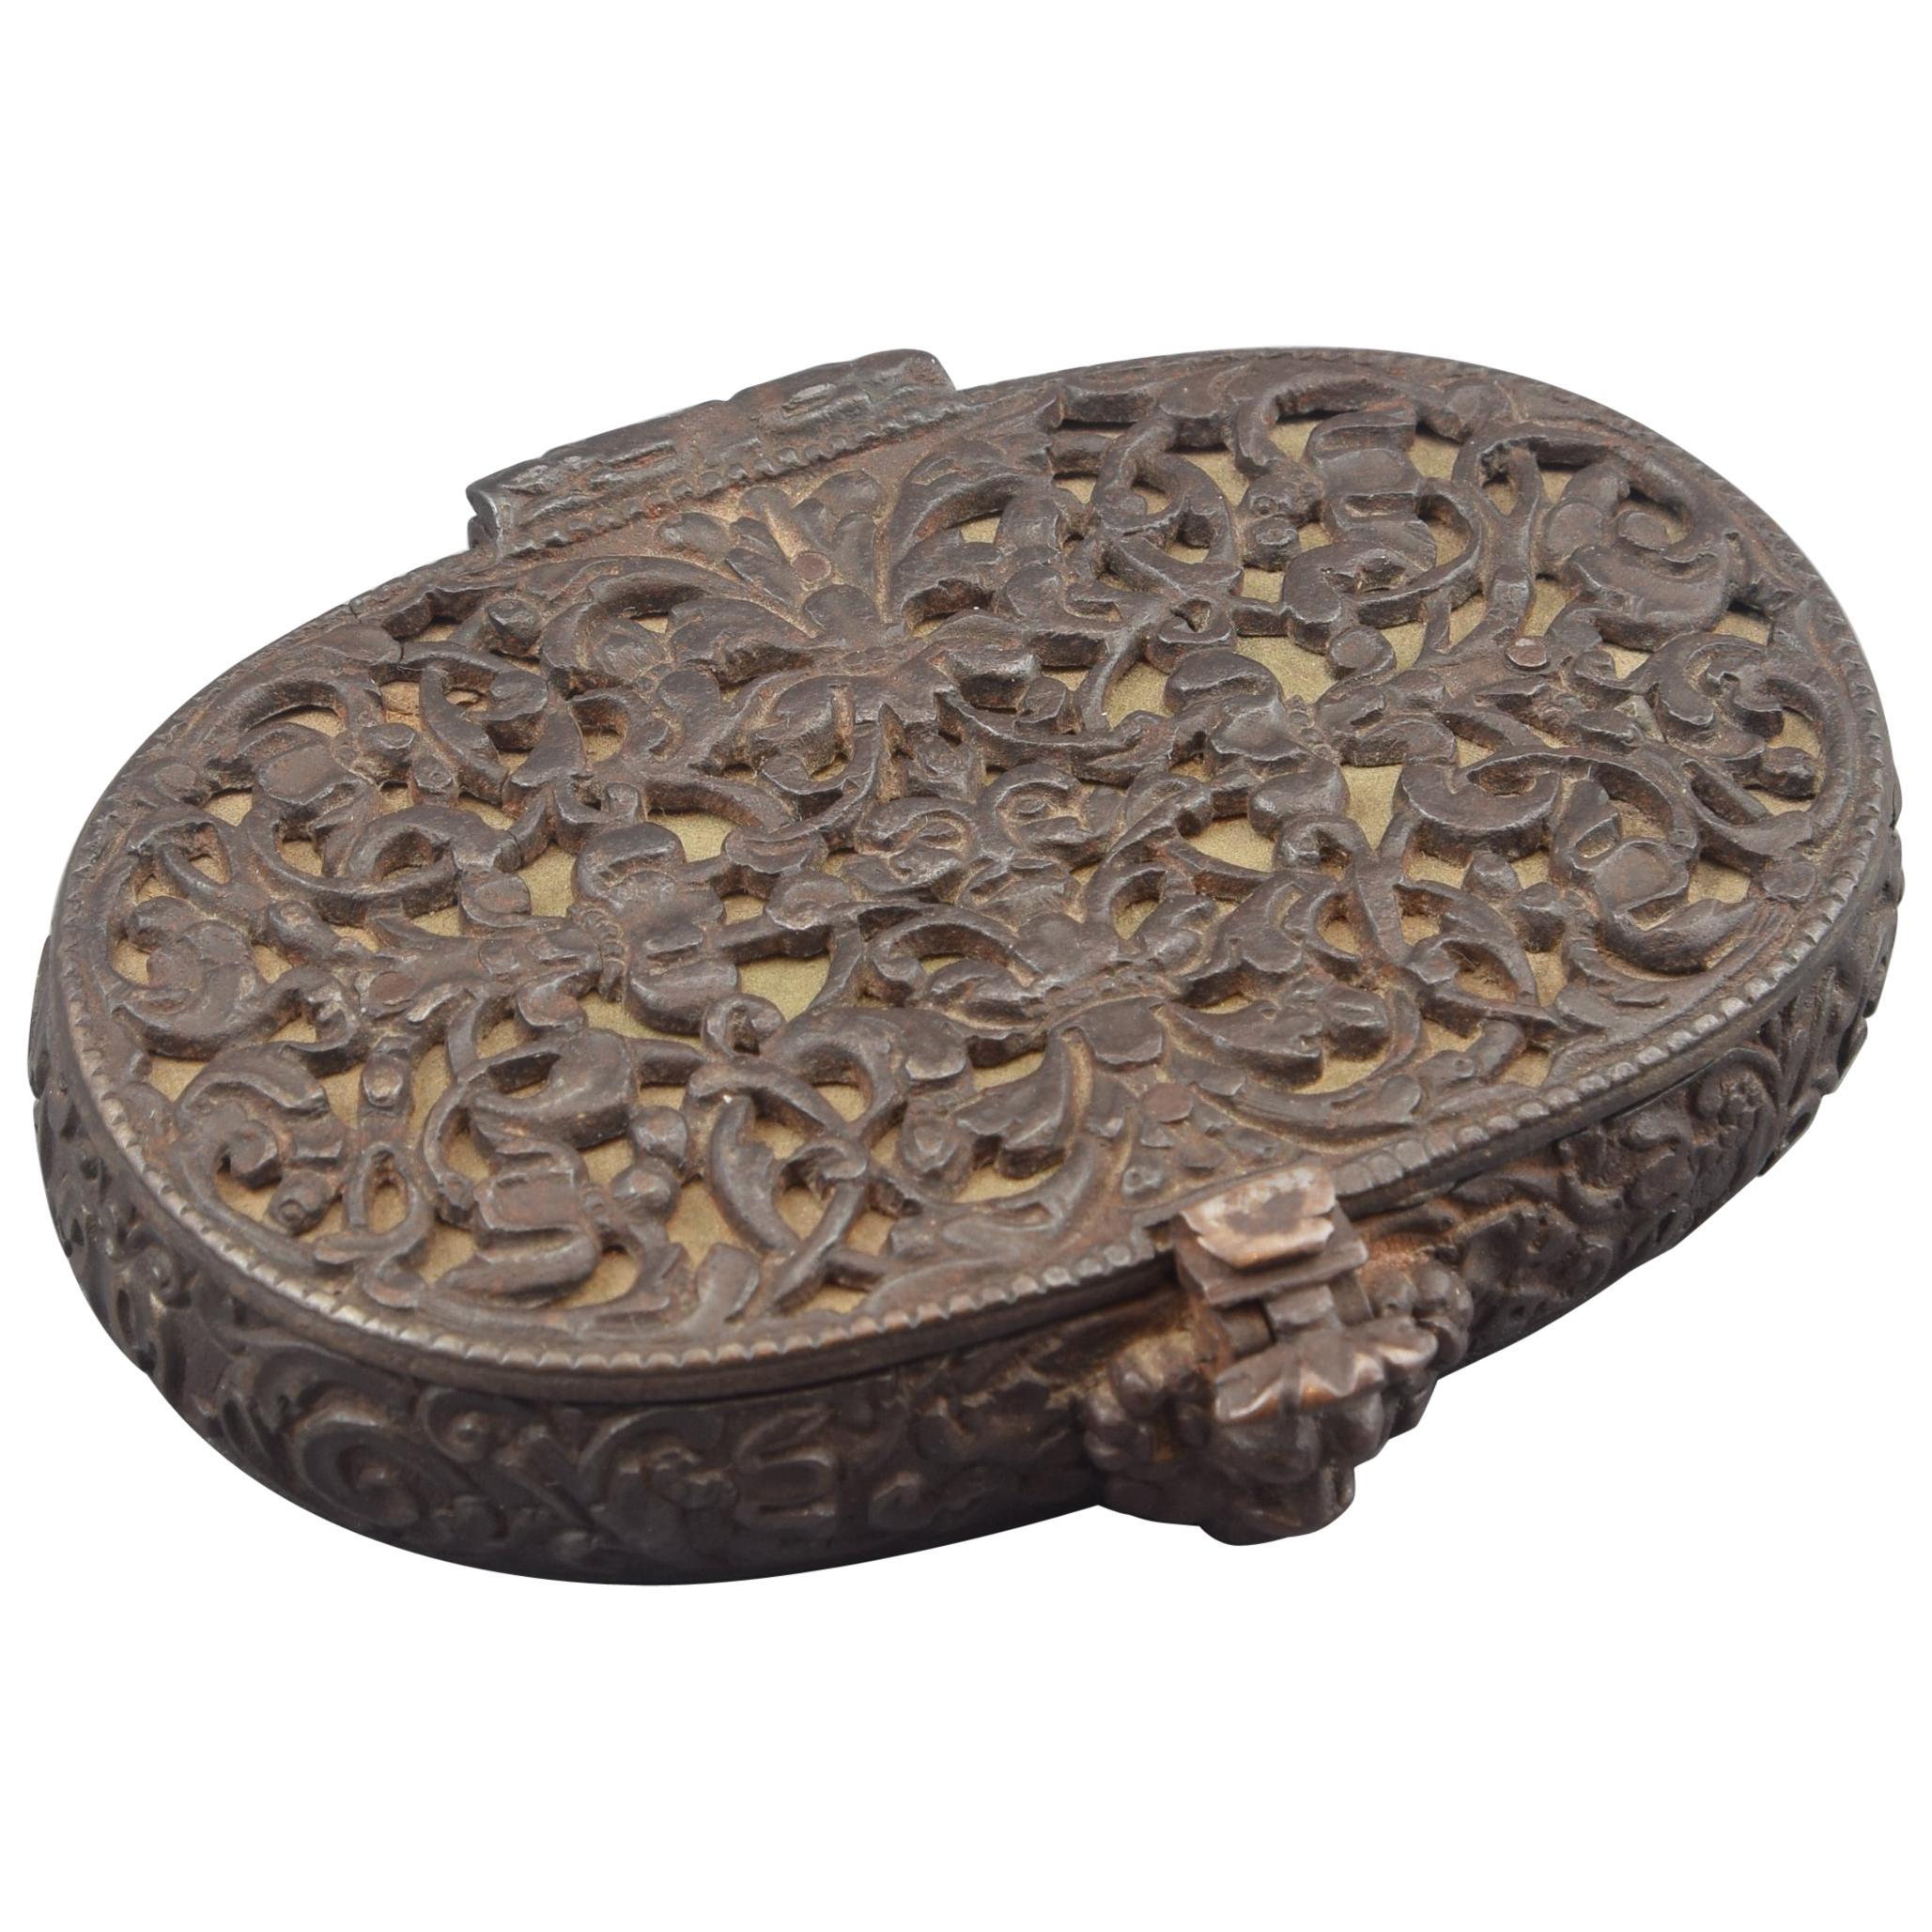 Wrought Iron Box, Germany, 17th Century